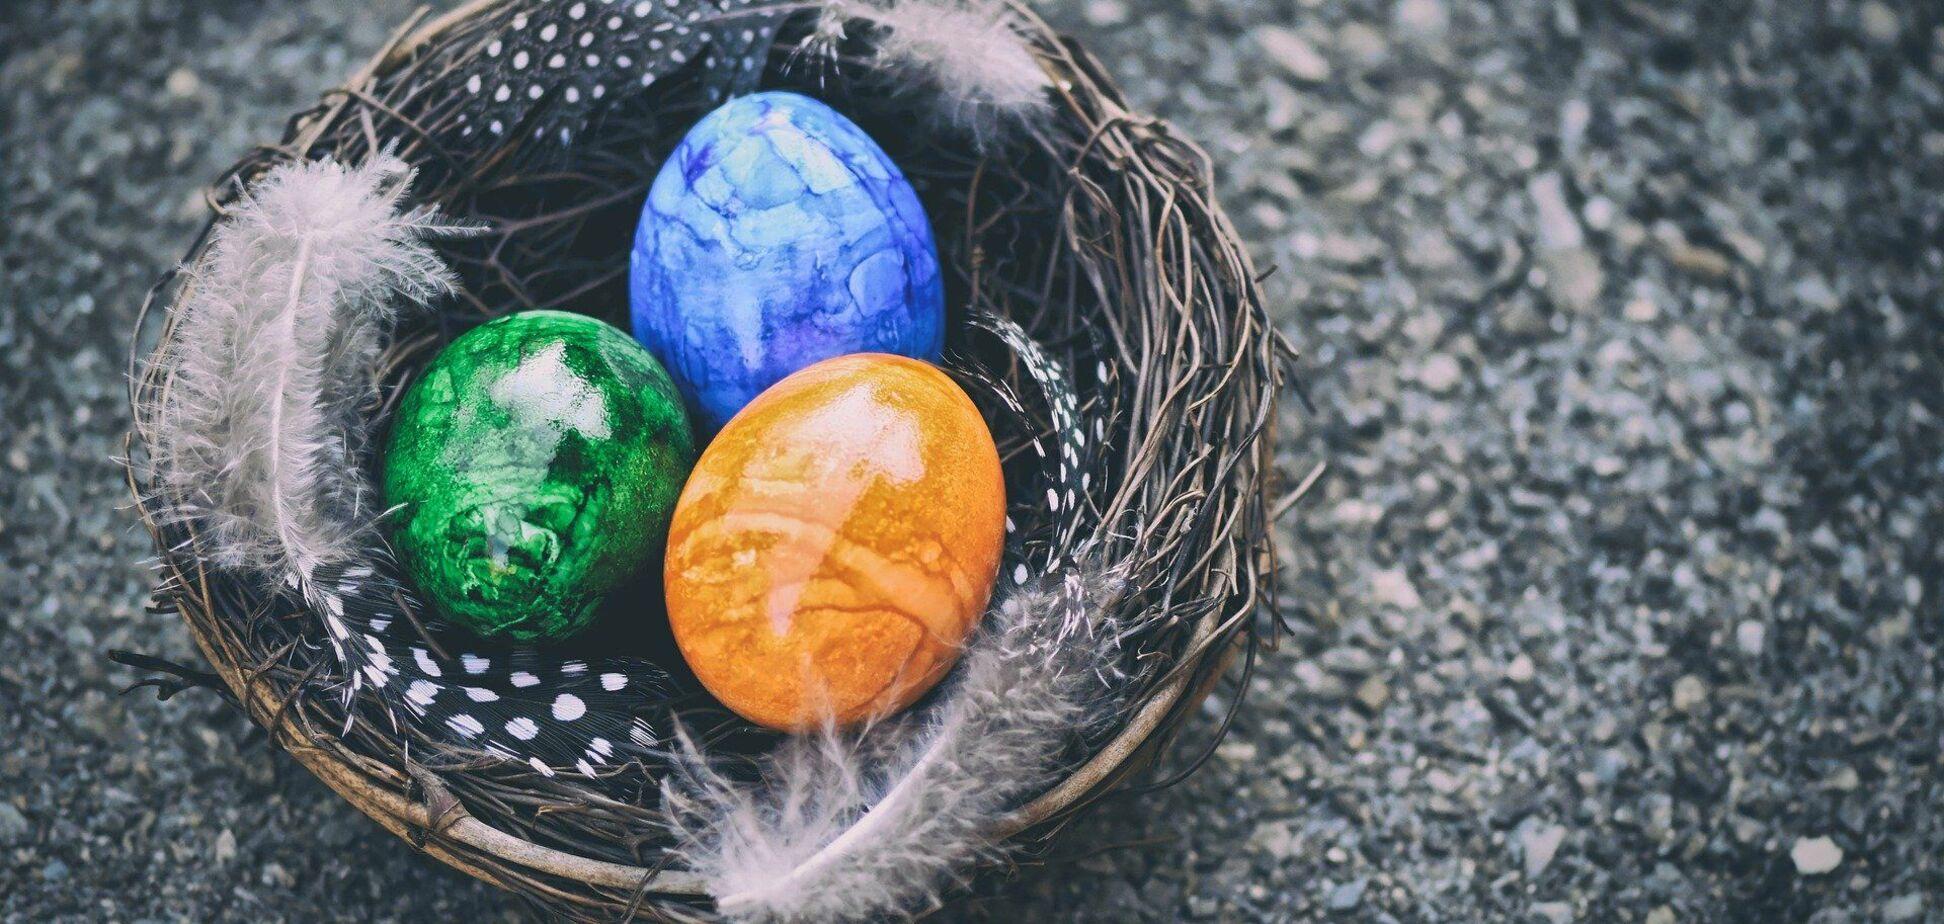 1 травня: свята, прикмети на Кузьму Городника та іменинники